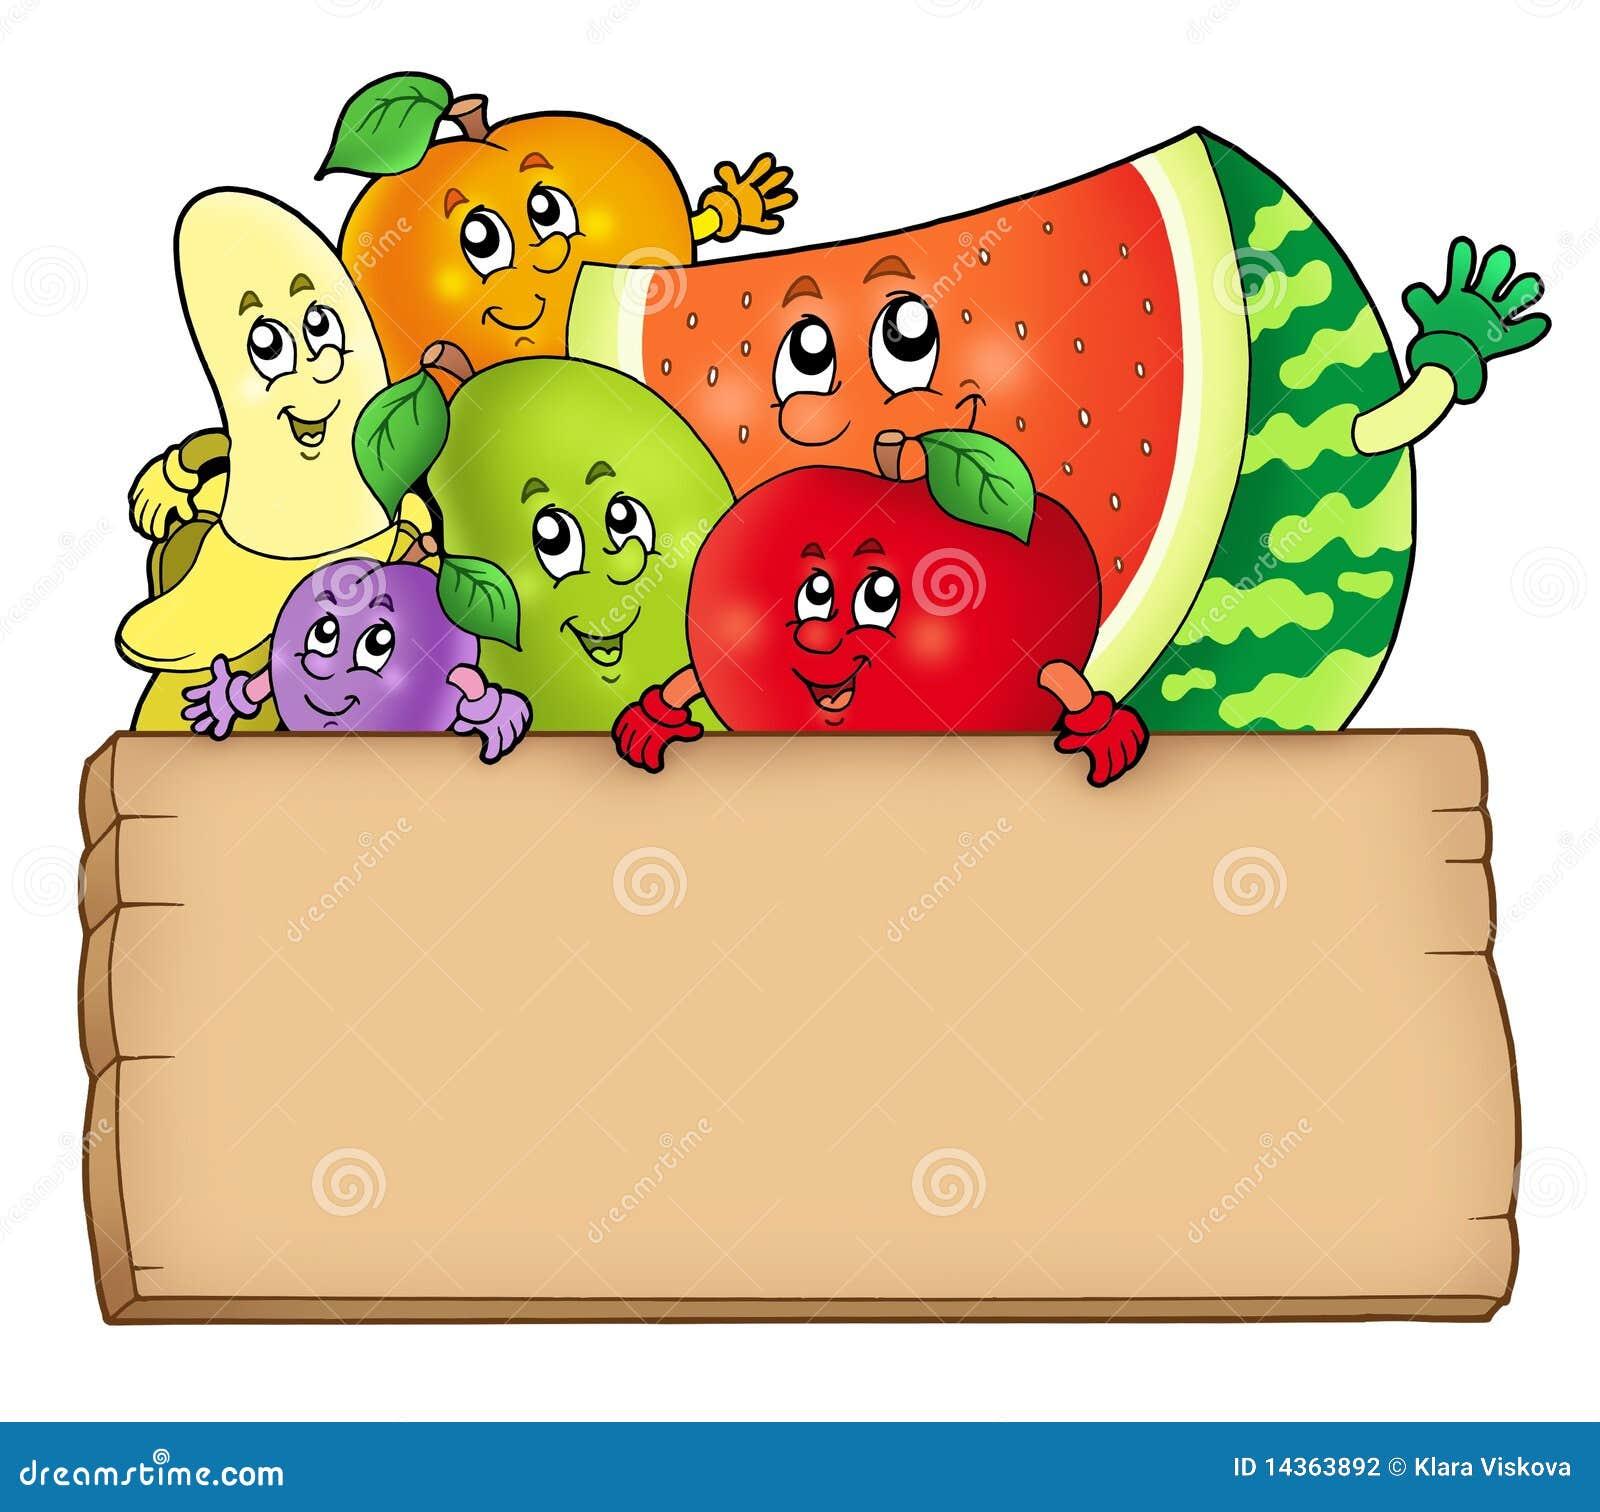 Various - Fruit 2 - Melon